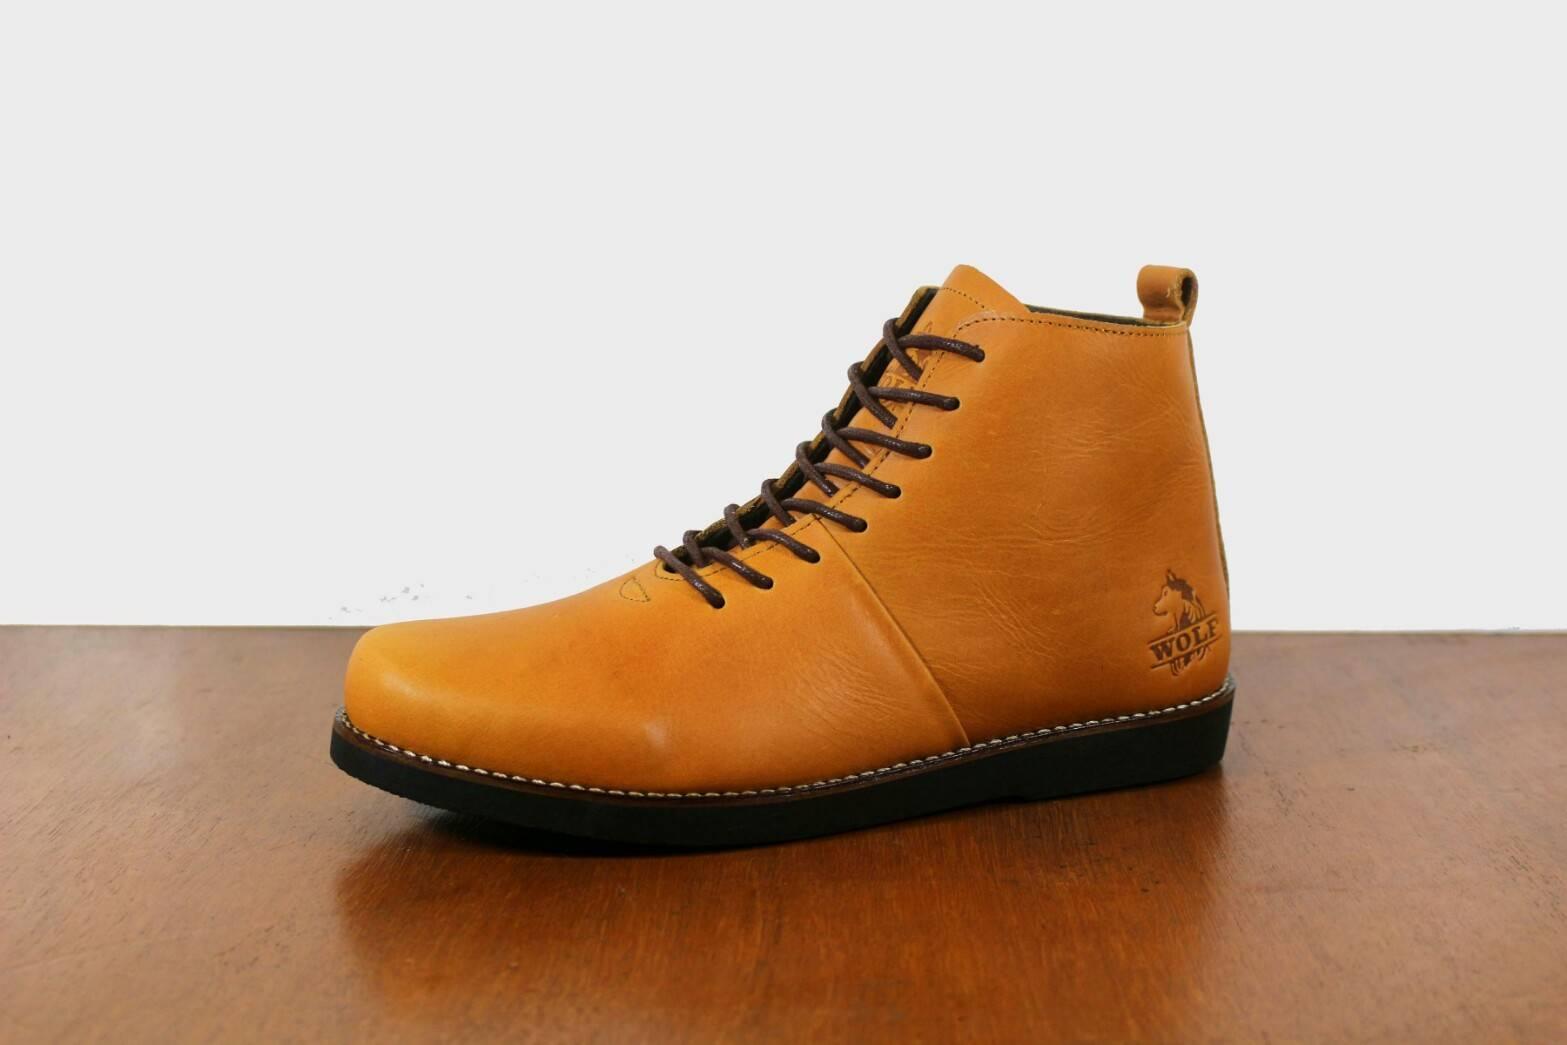 Sepatu Boots Brodo Original - Sepatu Kulit Asli - Sepatu Boots Laris